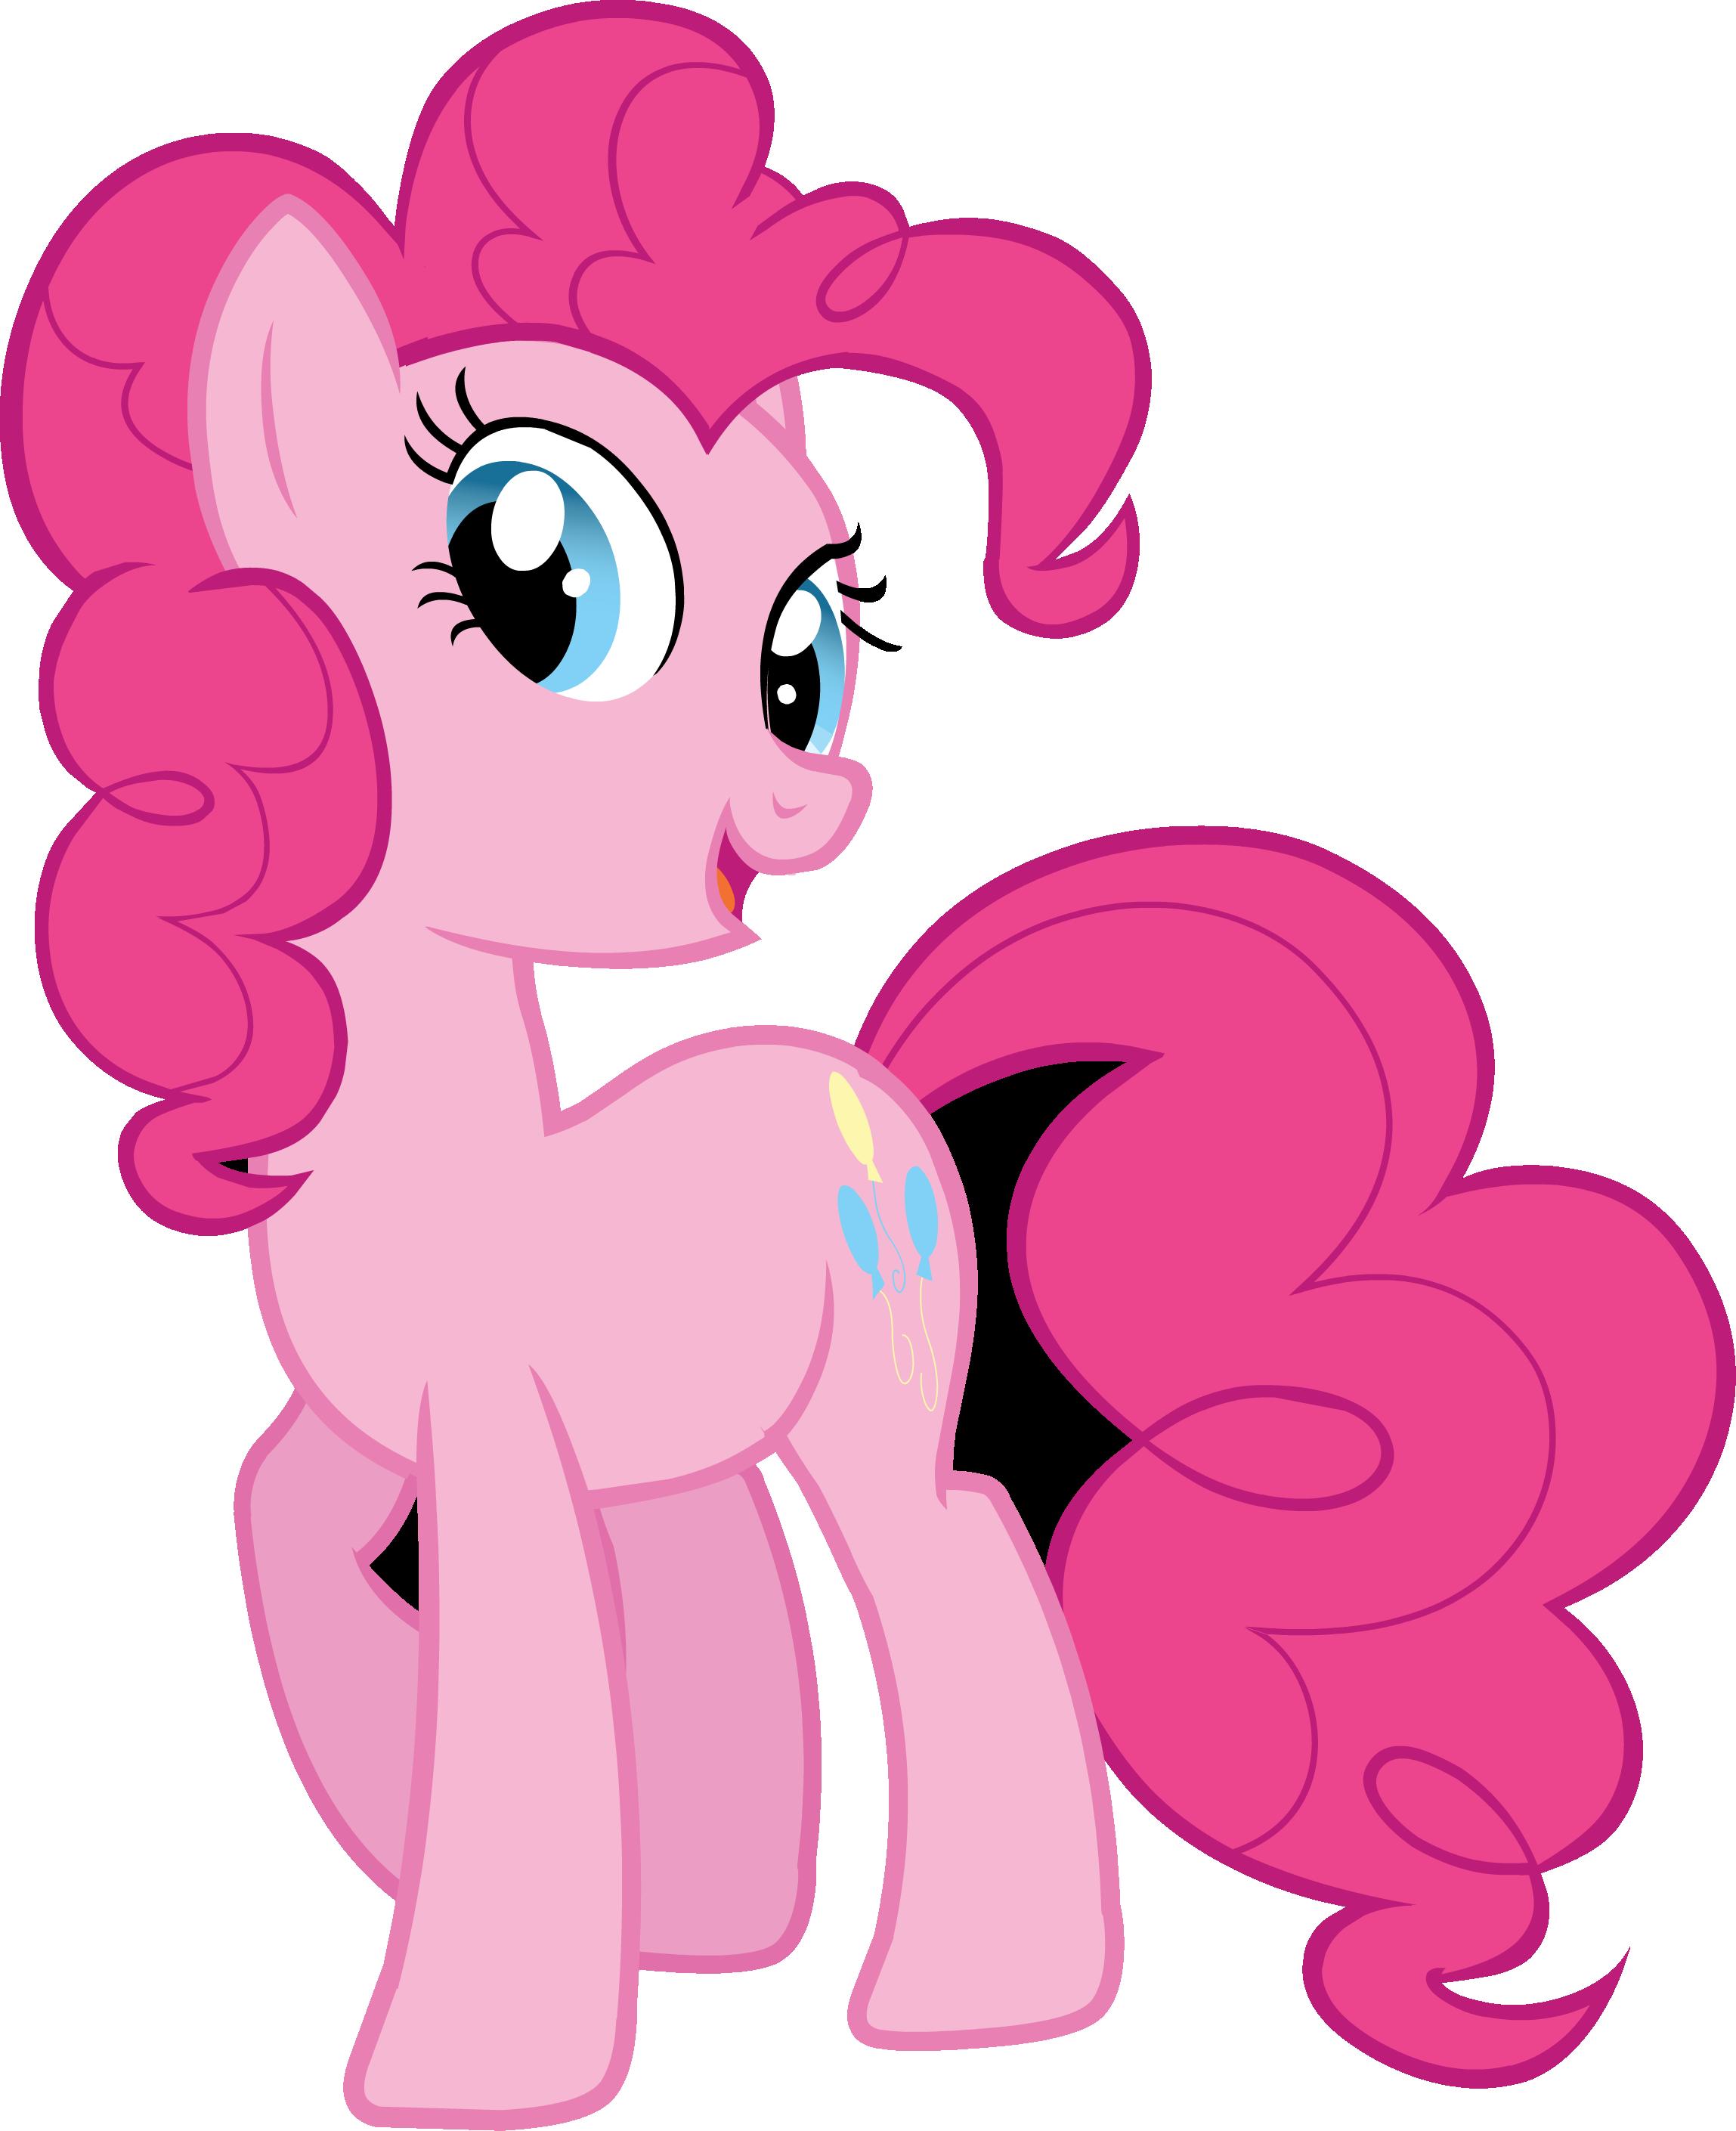 Pinkie Pie My Little Pony Friendship Is Magic Wiki Free Image